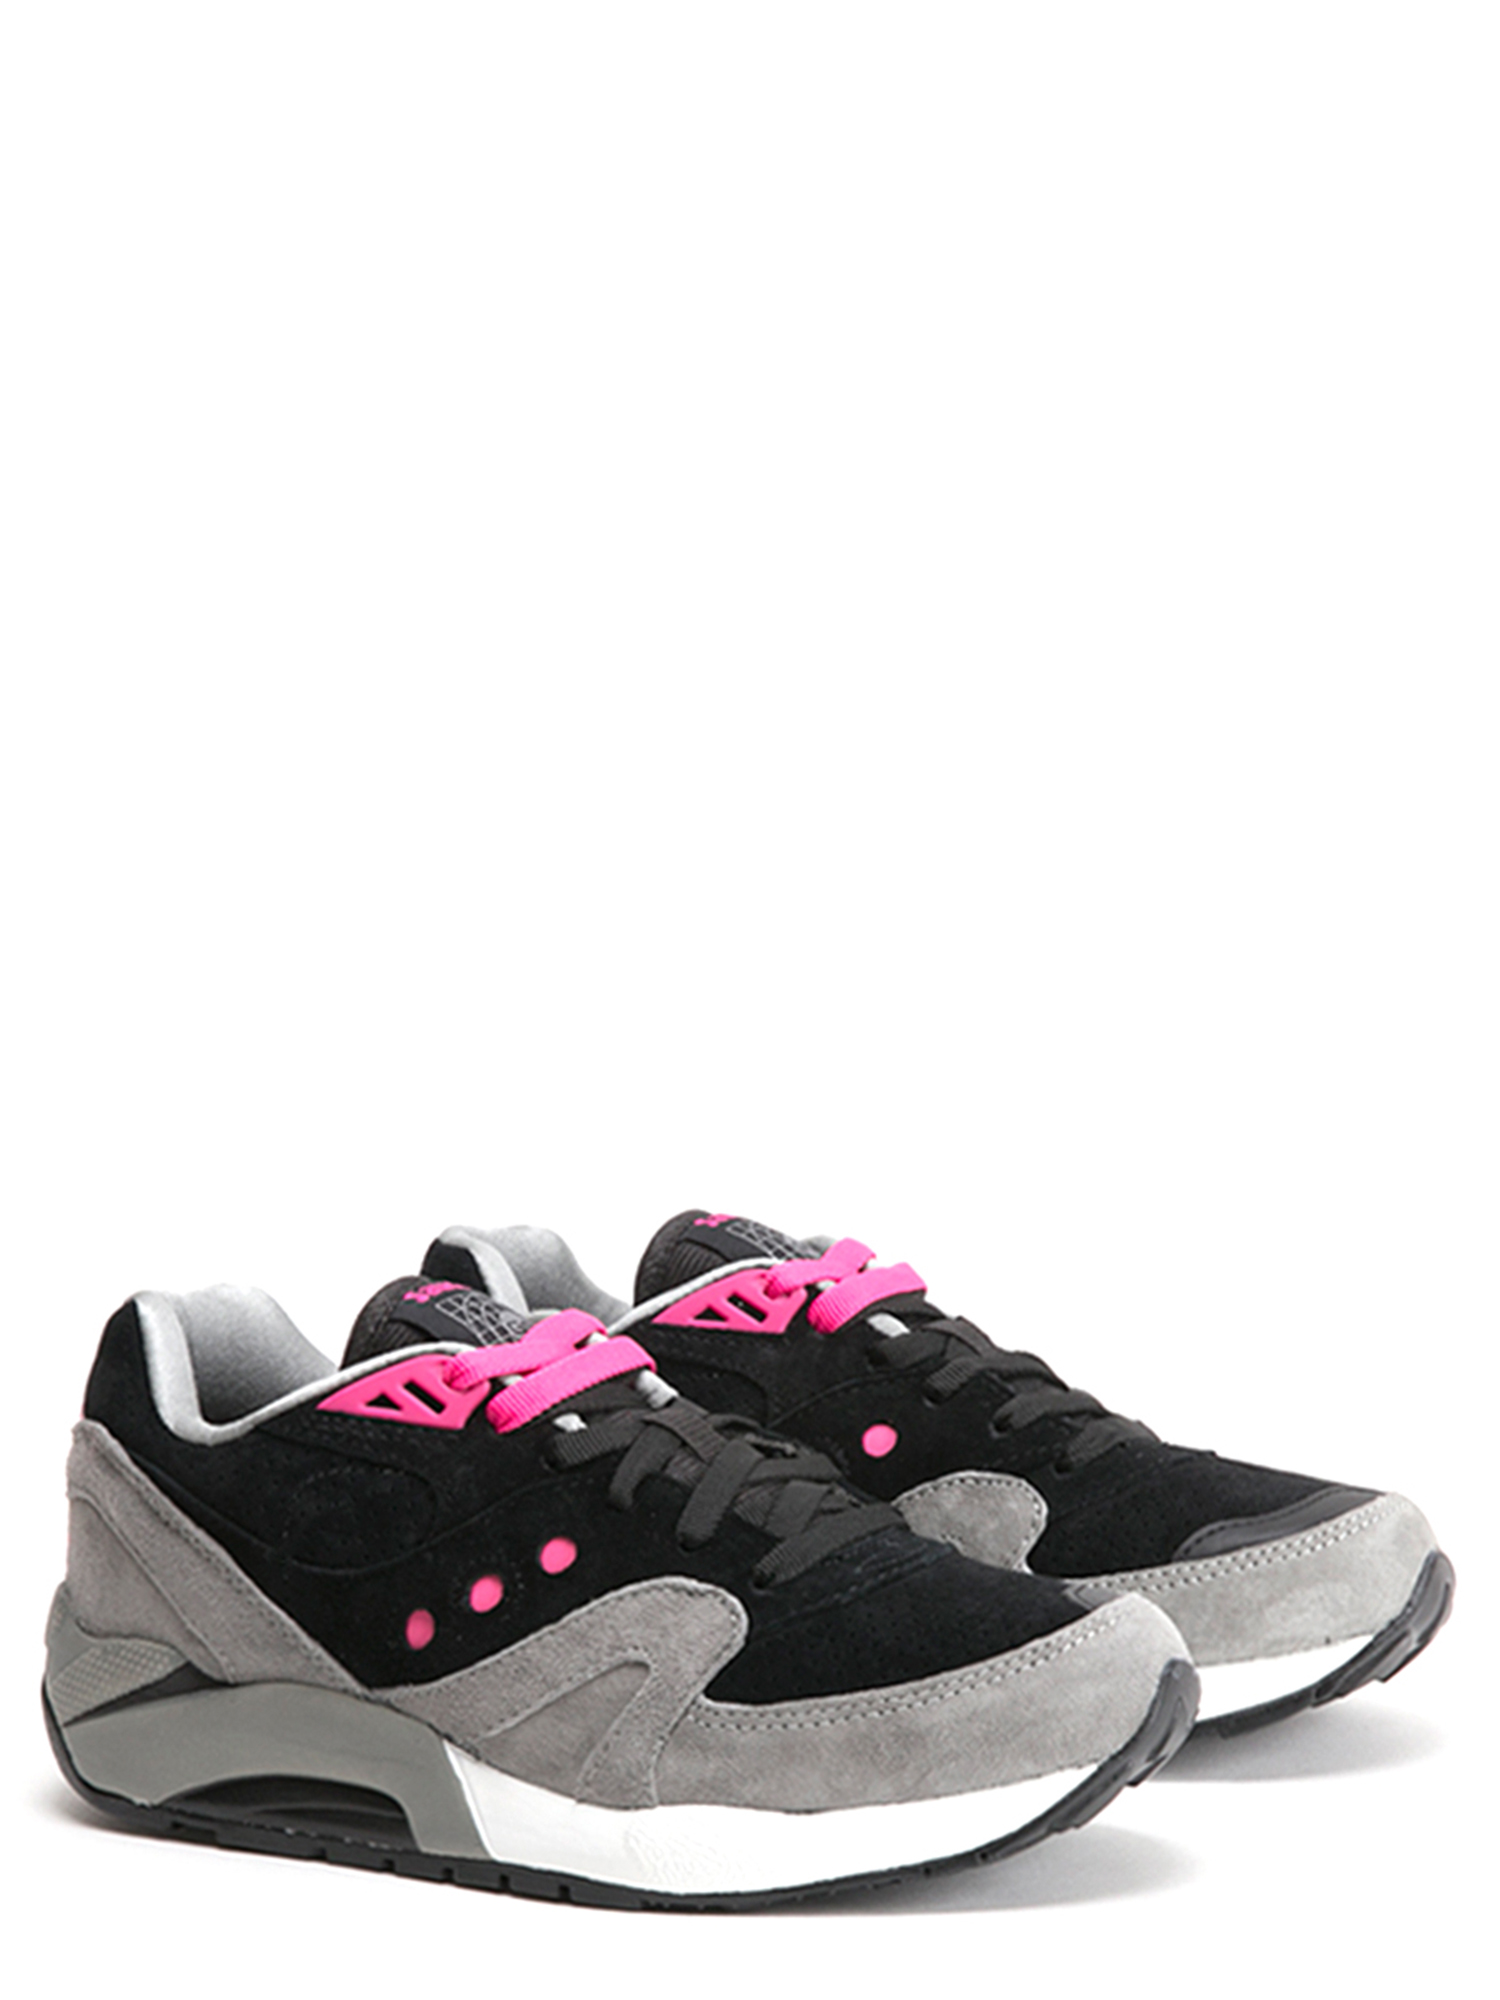 Saucony Men's G9 Control Sneakers S70163-4 Black Grey by